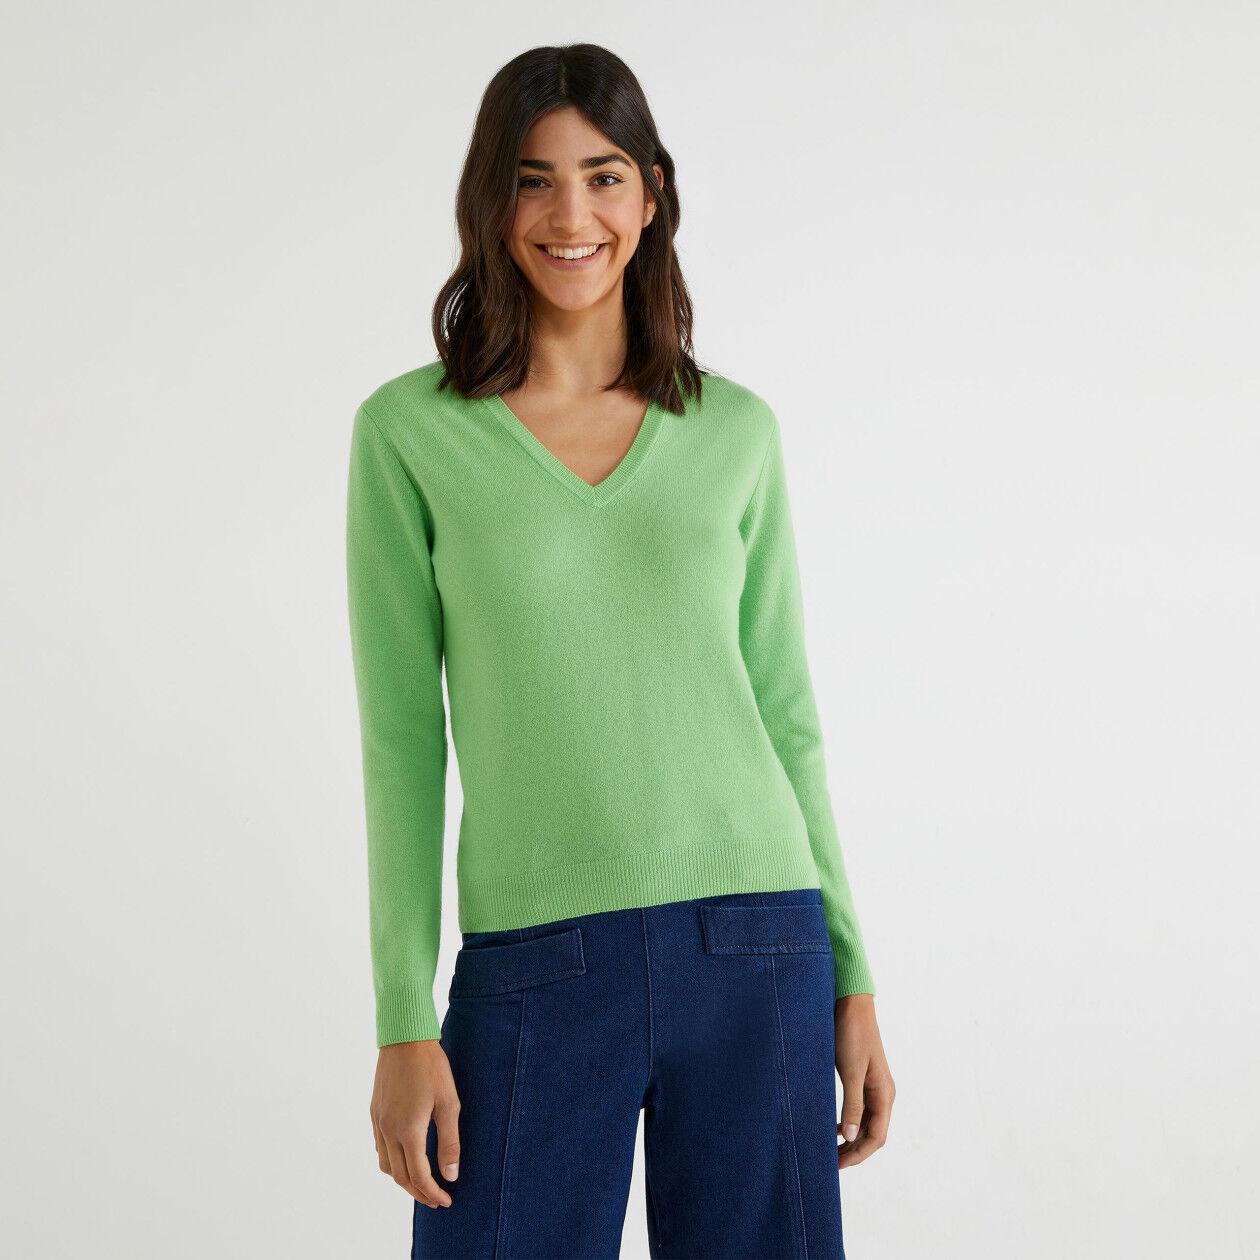 Jersey de 100% lana virgen con escote de pico